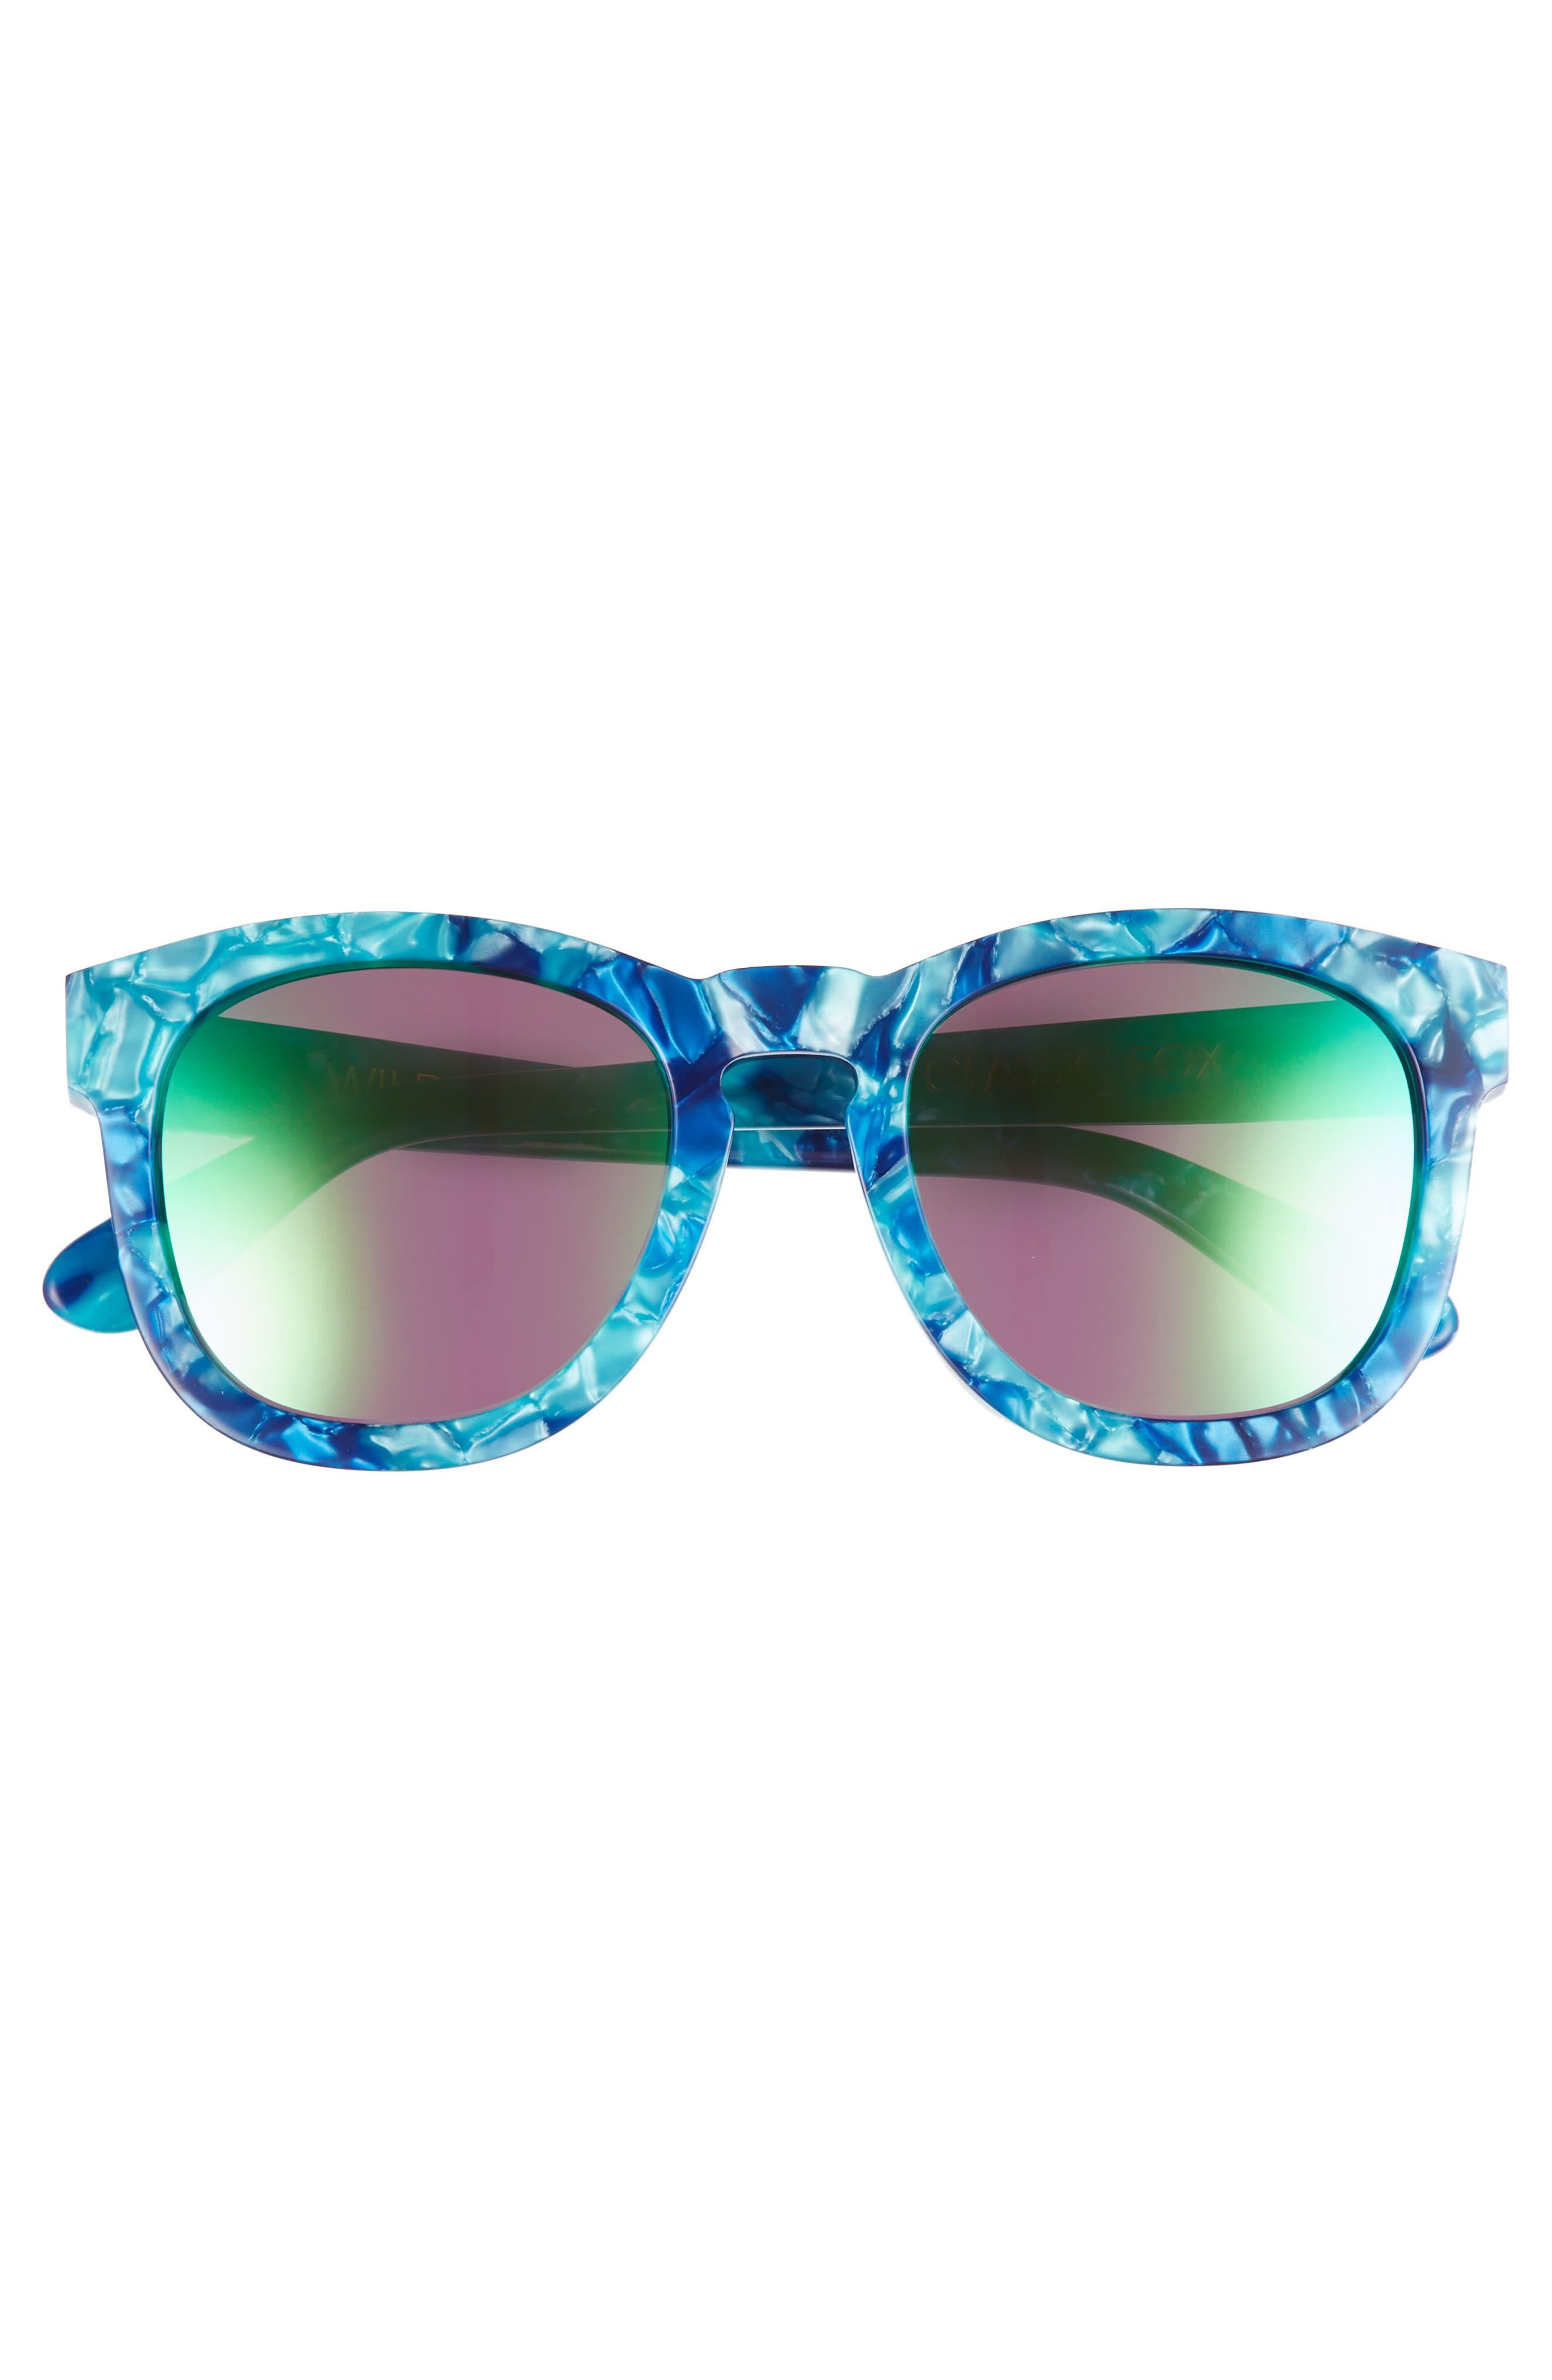 WILDFOX, Classic Fox - Deluxe 59mm Sunglasses, Alternate thumbnail 3, color, MONTEREY/ GREEN MIRROR